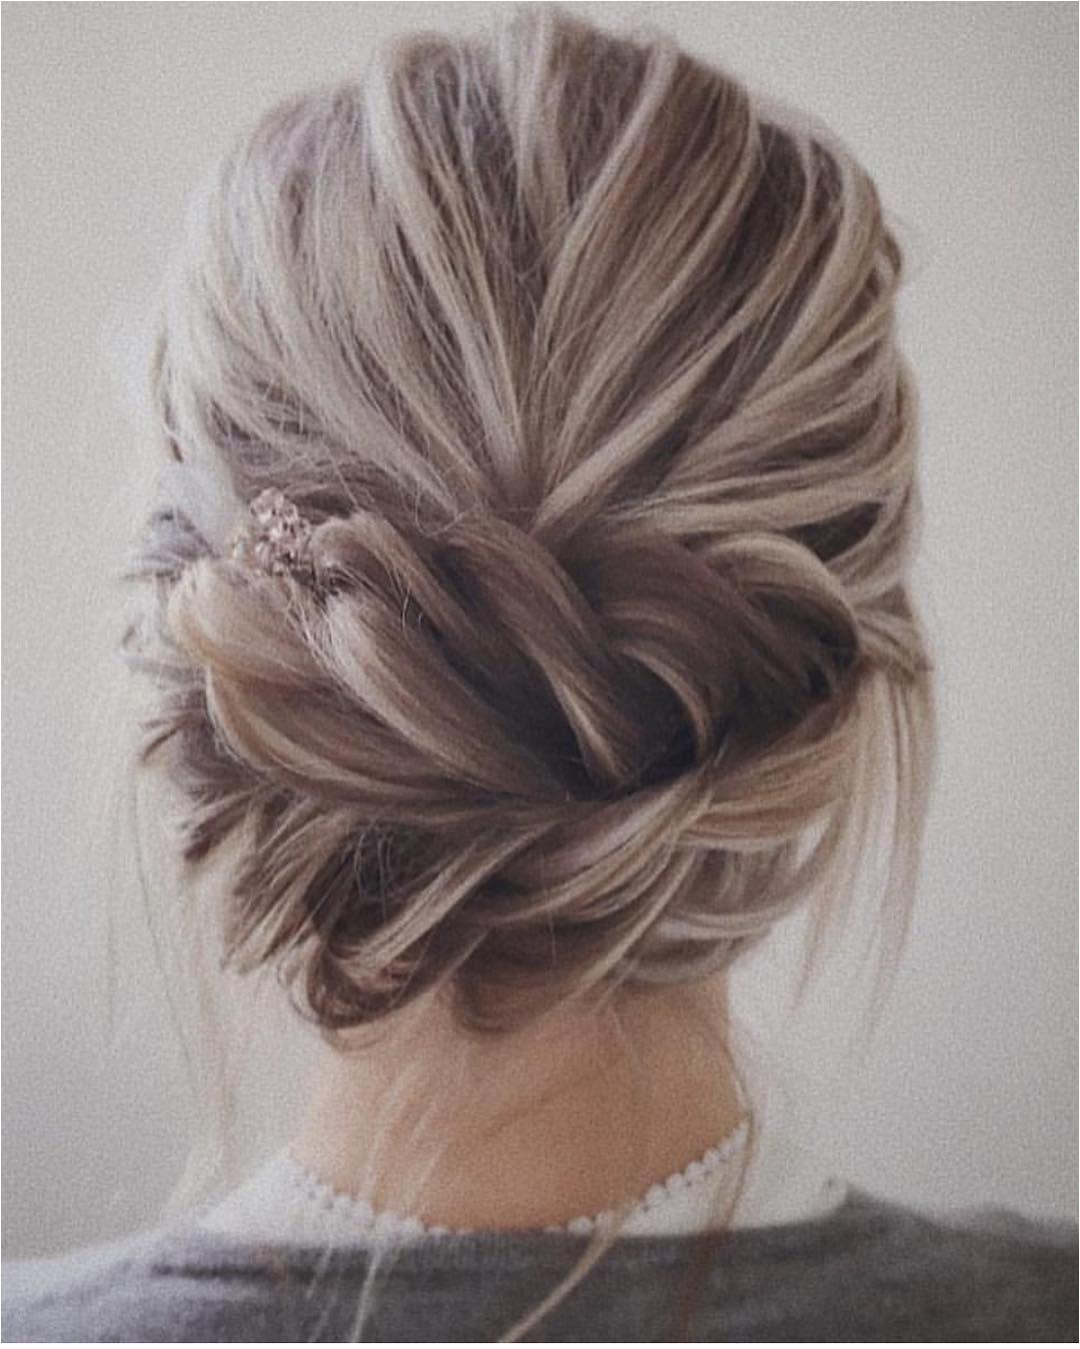 Trendy Updos for Medium Length Hair Updo Hairstyle Ideas InterestingThings